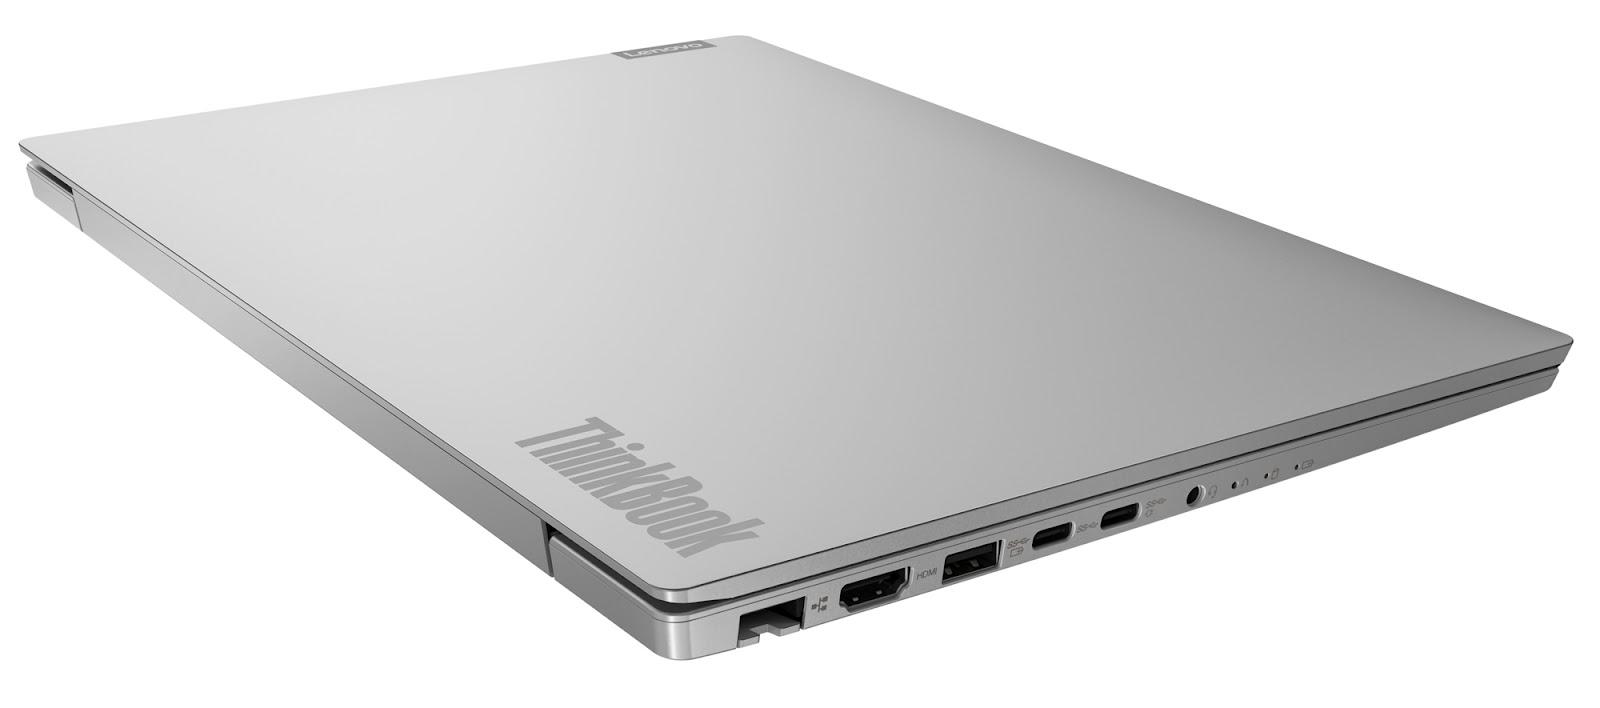 Фото 3. Ноутбук Lenovo ThinkBook 14 IIL (20SL00F1RU)